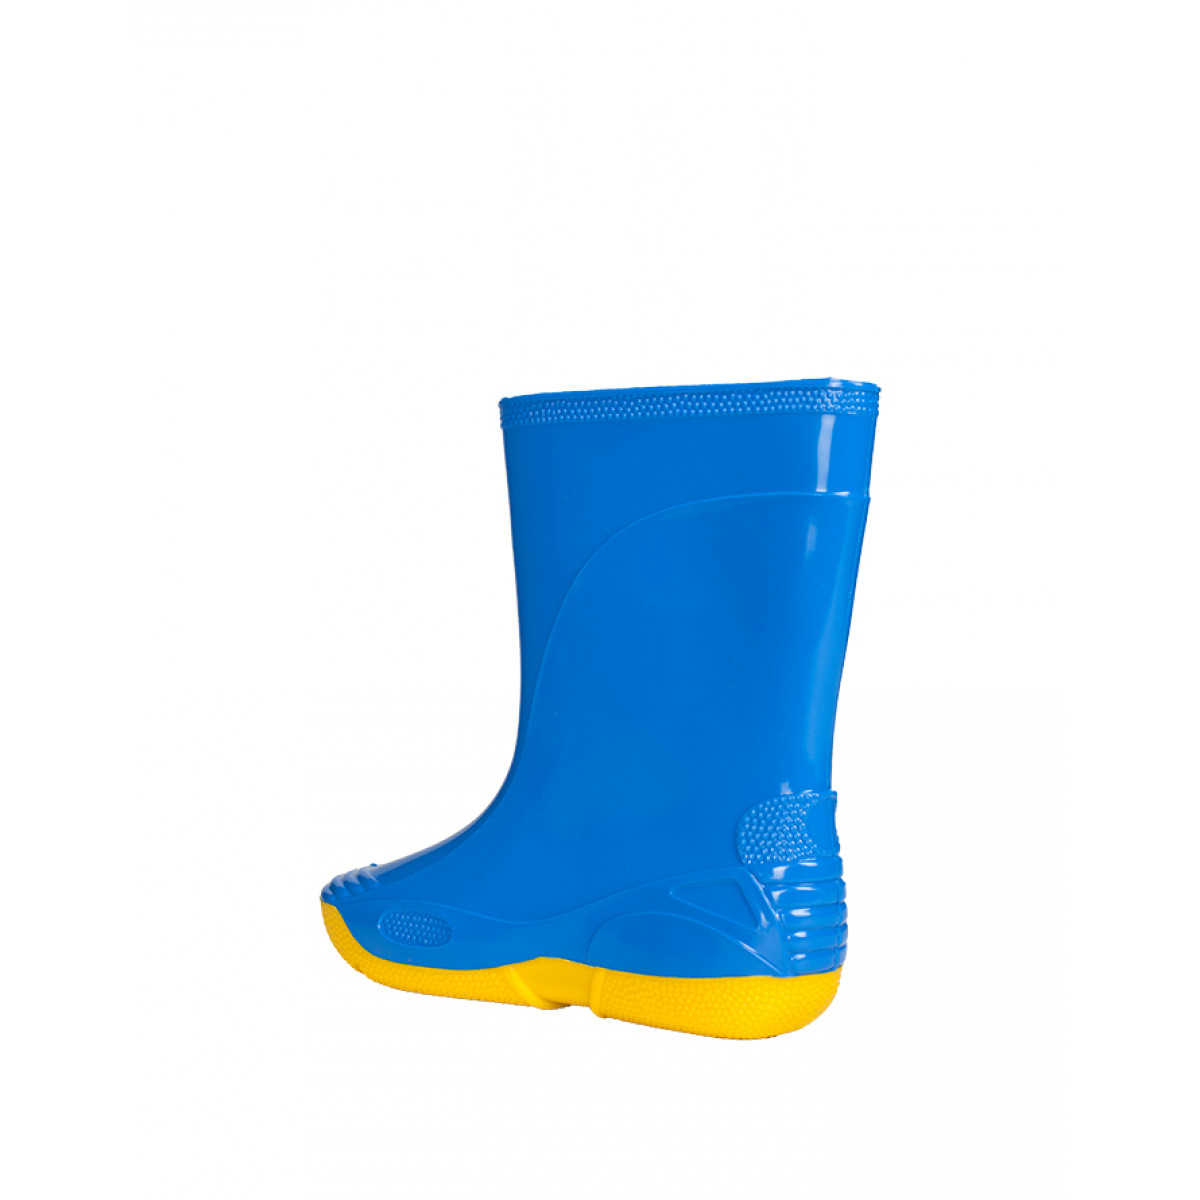 Kids' Wellies VIVID, Blue/Yellow